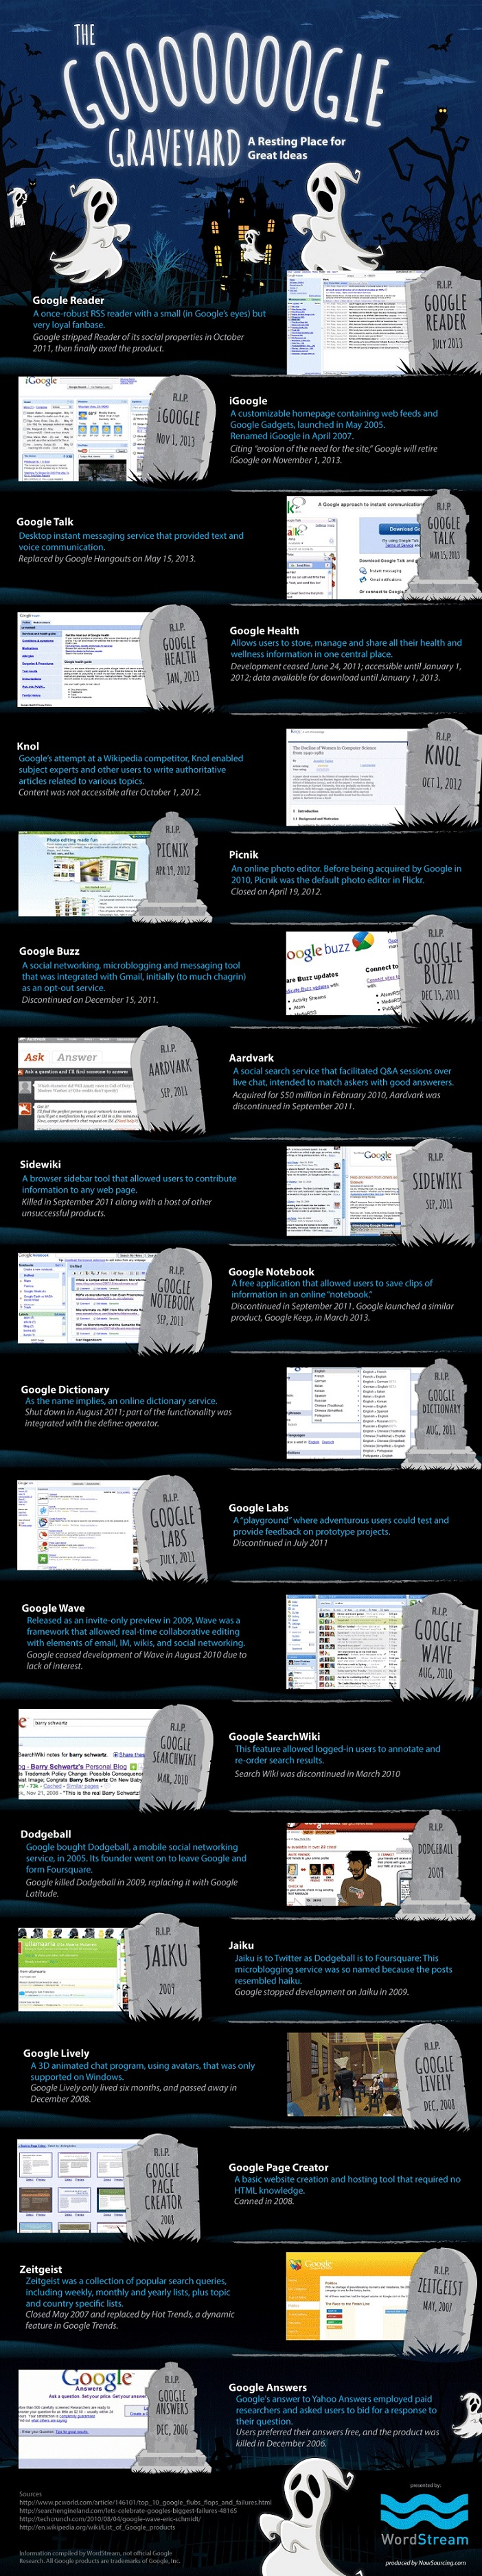 Google-Graveyard-Infographic